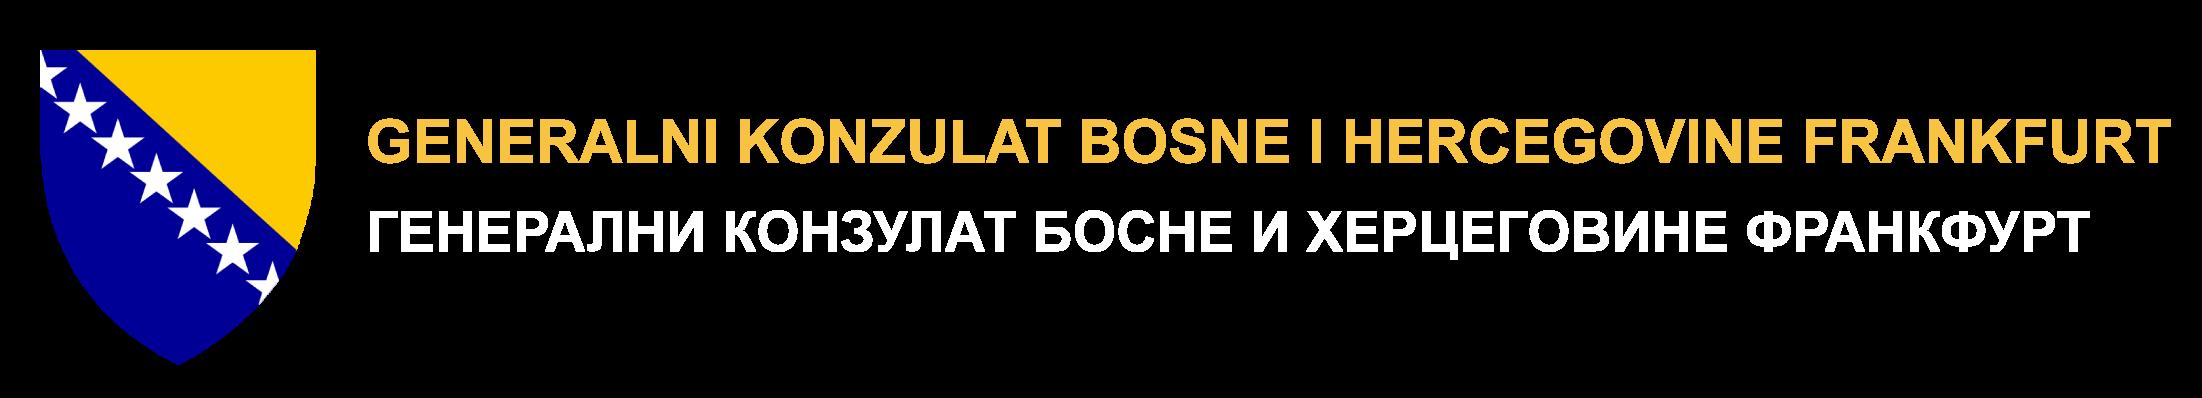 Generalni Konzulat Bosne i Herzegovine